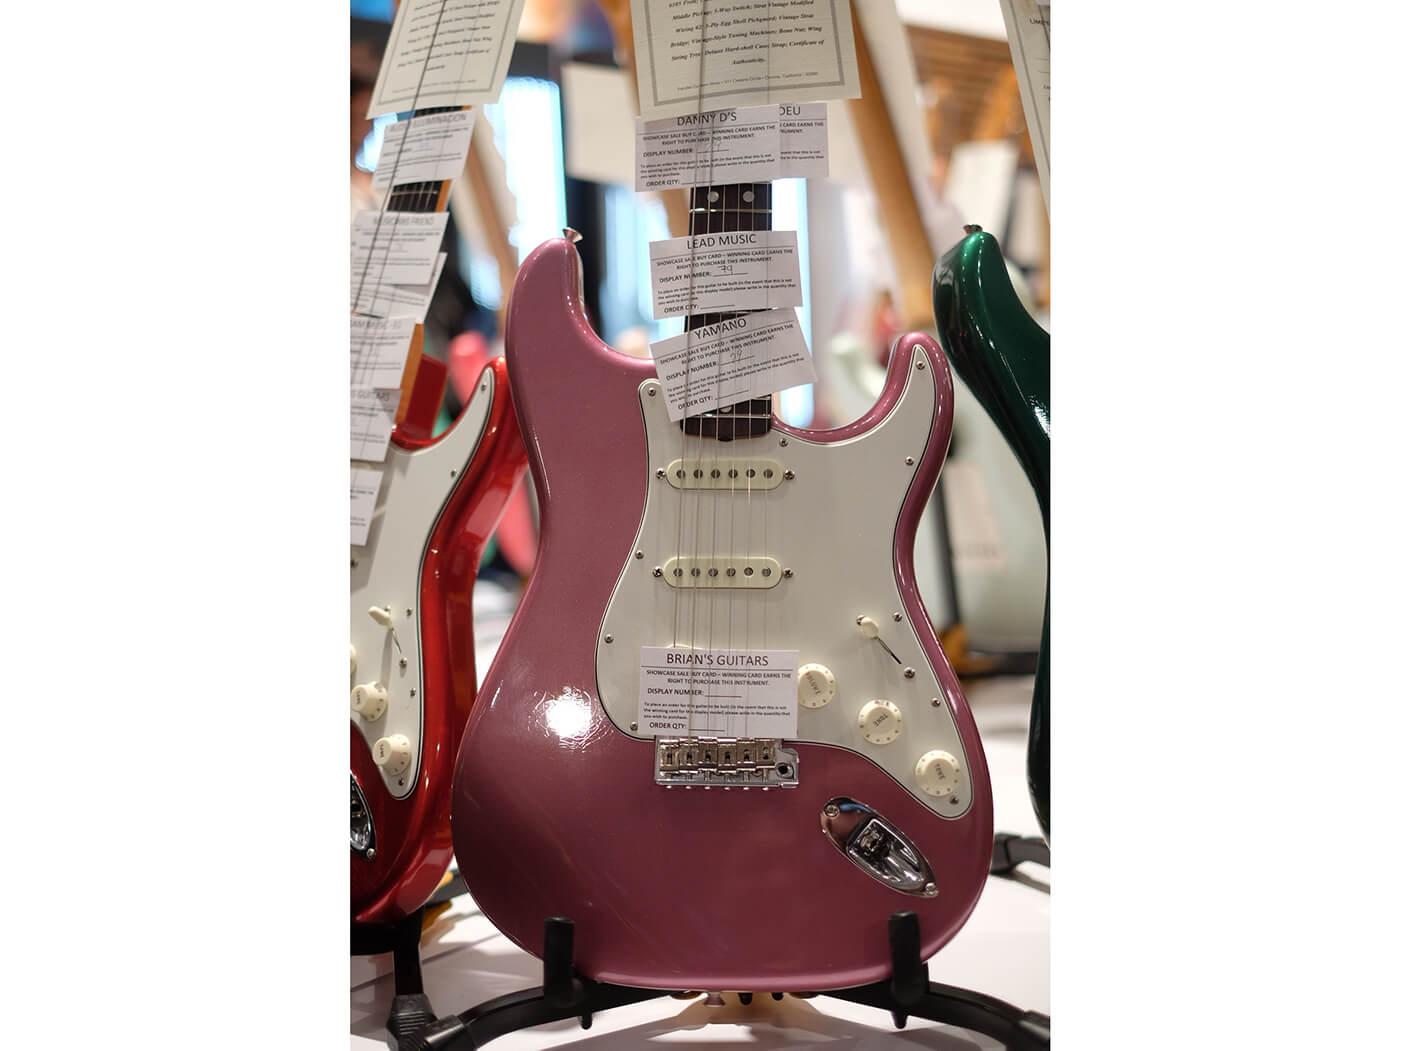 Limited Edition 1965 Stratocaster Lush Closet Classic, Burgundy Mist Metallic